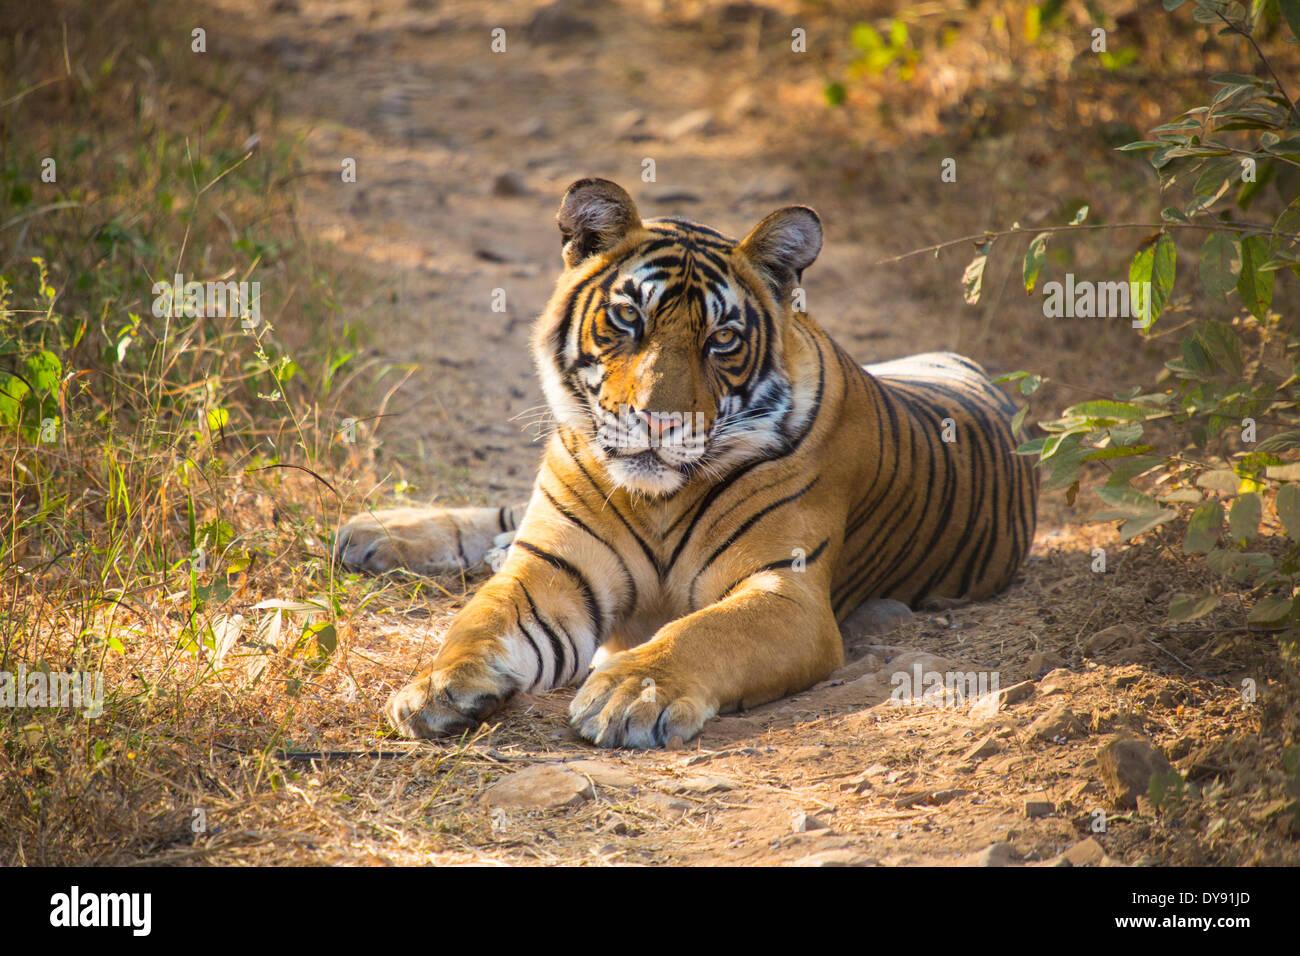 Indian, tiger, Ranthambore, national park, Asia, India, Rajasthan, animal, - Stock Image